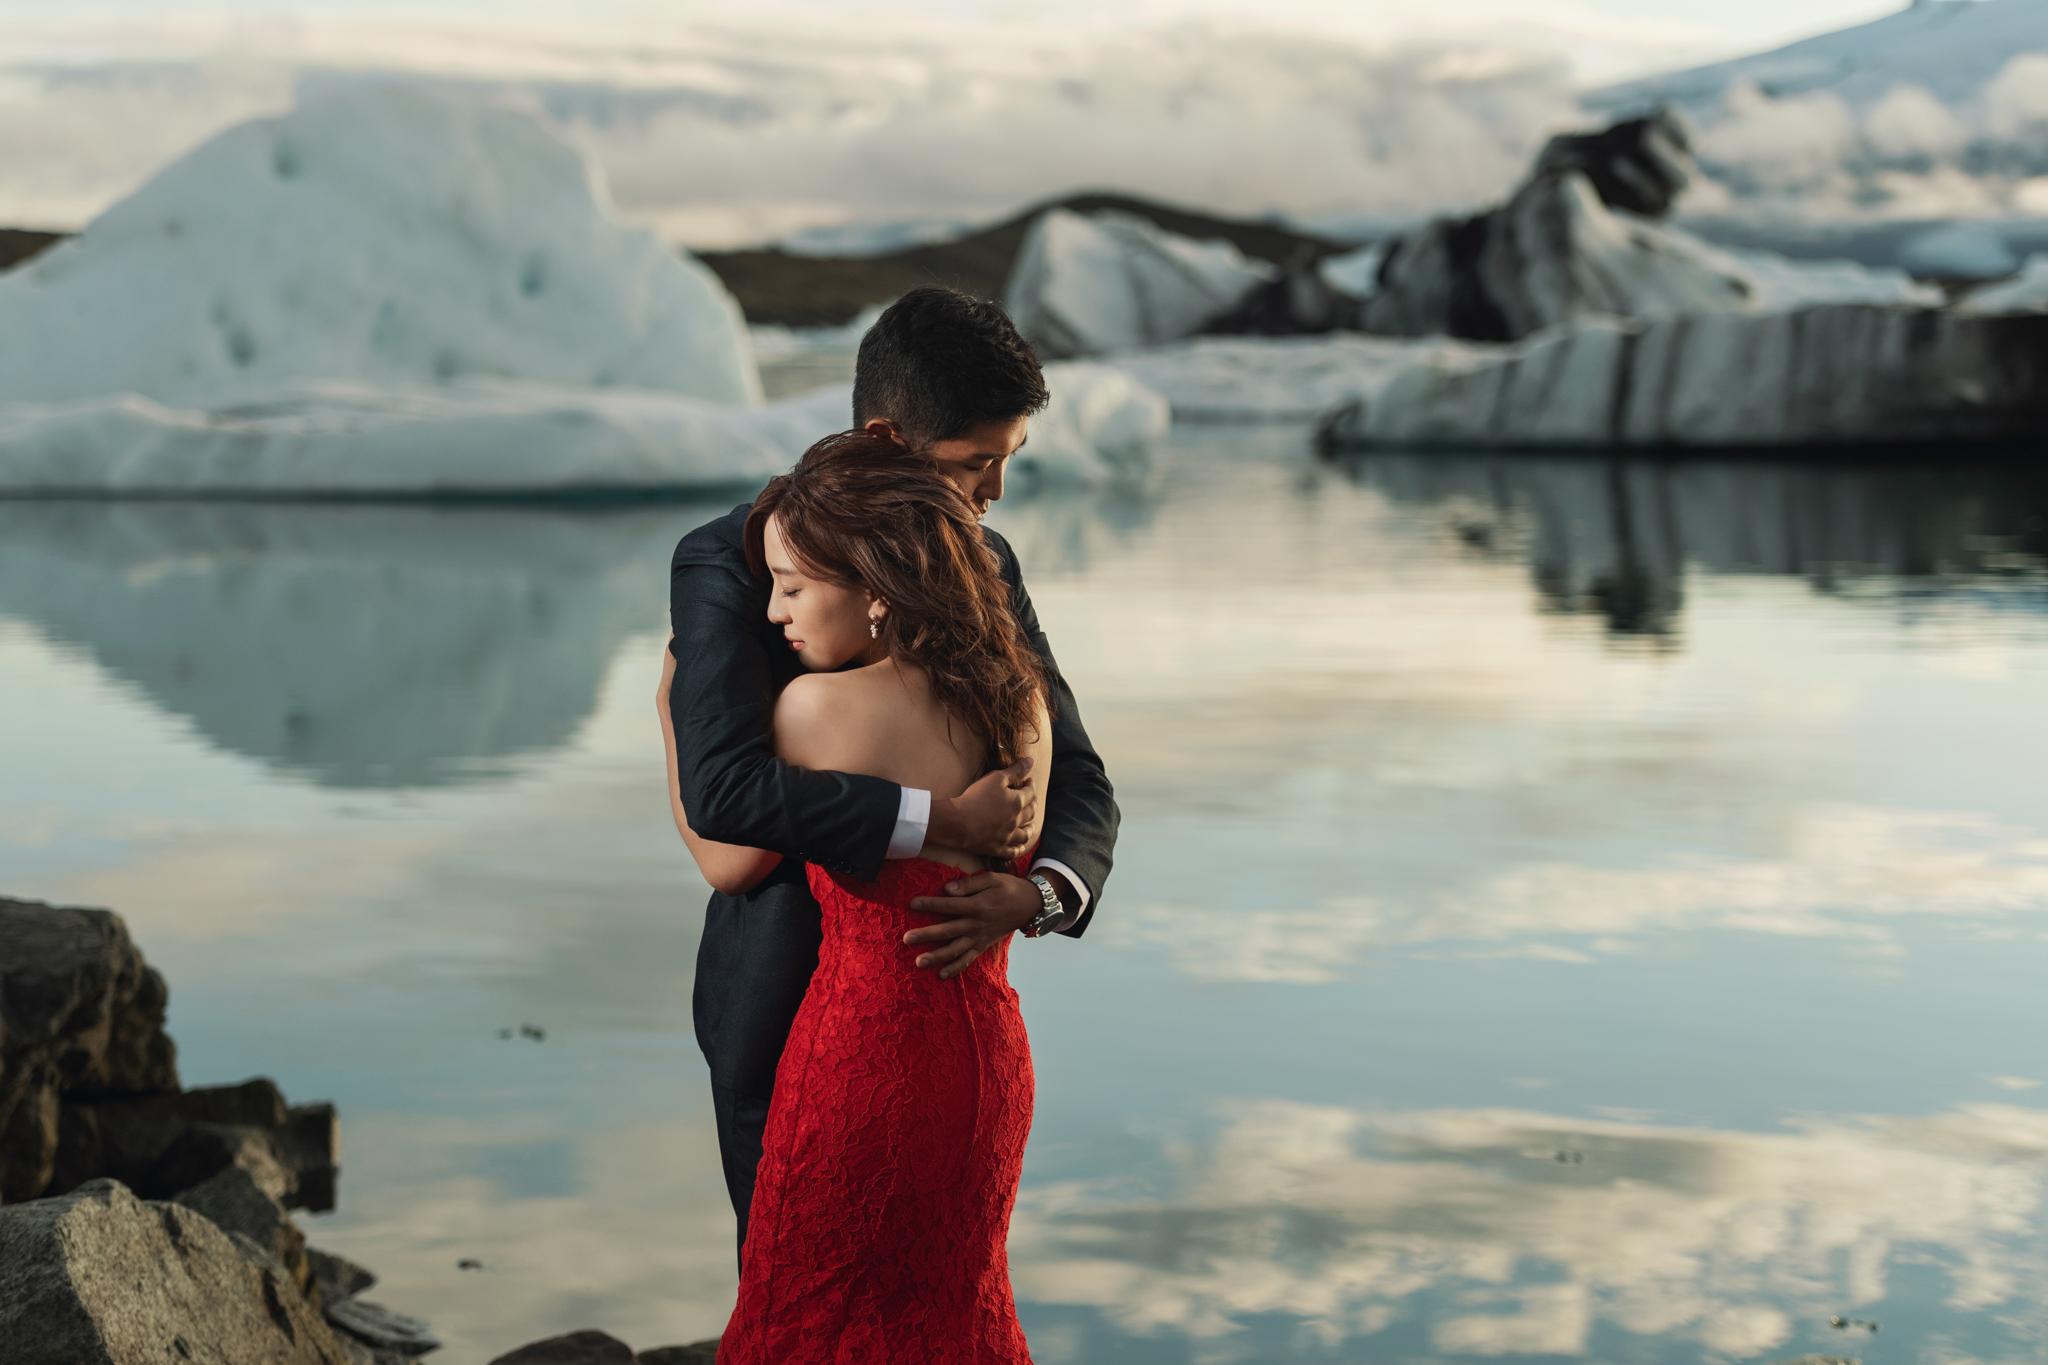 Donfer, EASTERN WEDDING, Iceland, Pre-Wedding, 海外婚紗, 冰島婚紗, 冰河湖, 教堂山, 羽毛和峽谷, 黑沙灘